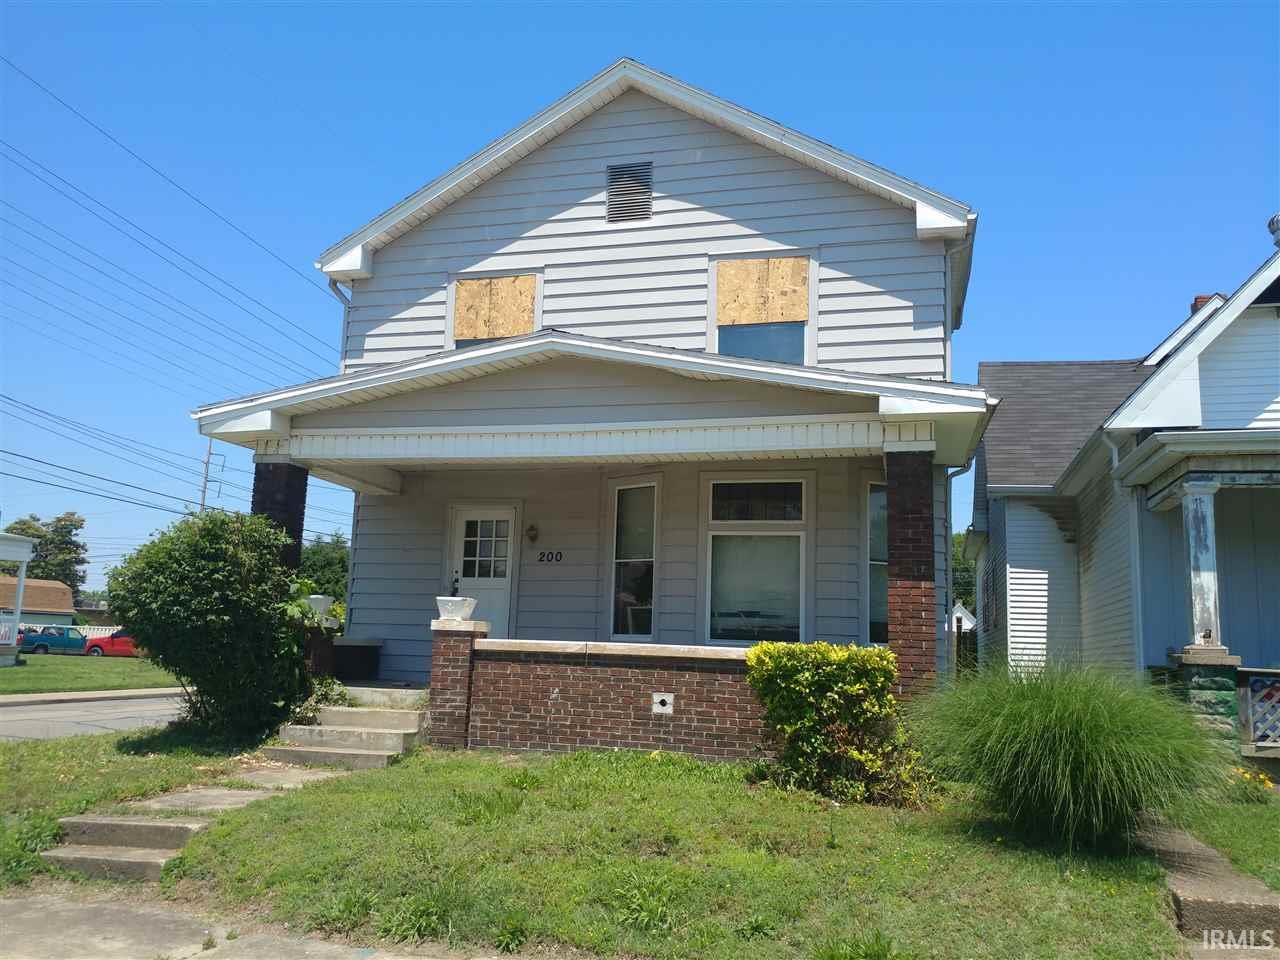 200 E Delaware, Evansville, IN 47711